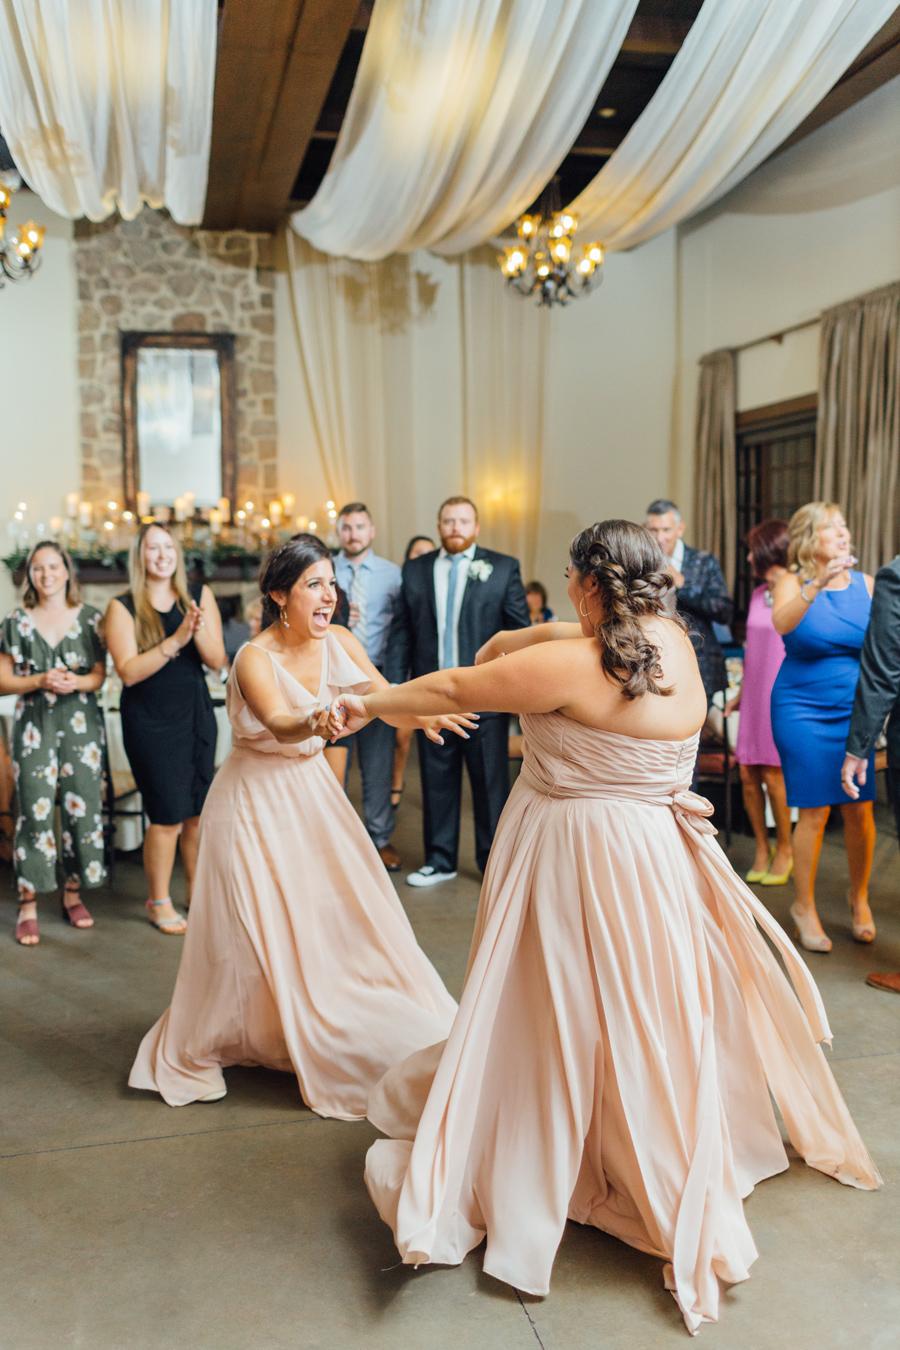 the-inn-at-leola-wedding-lancaster-pennsylvania-wedding-photographer-rebeka-viola-photograhy (132).jpg